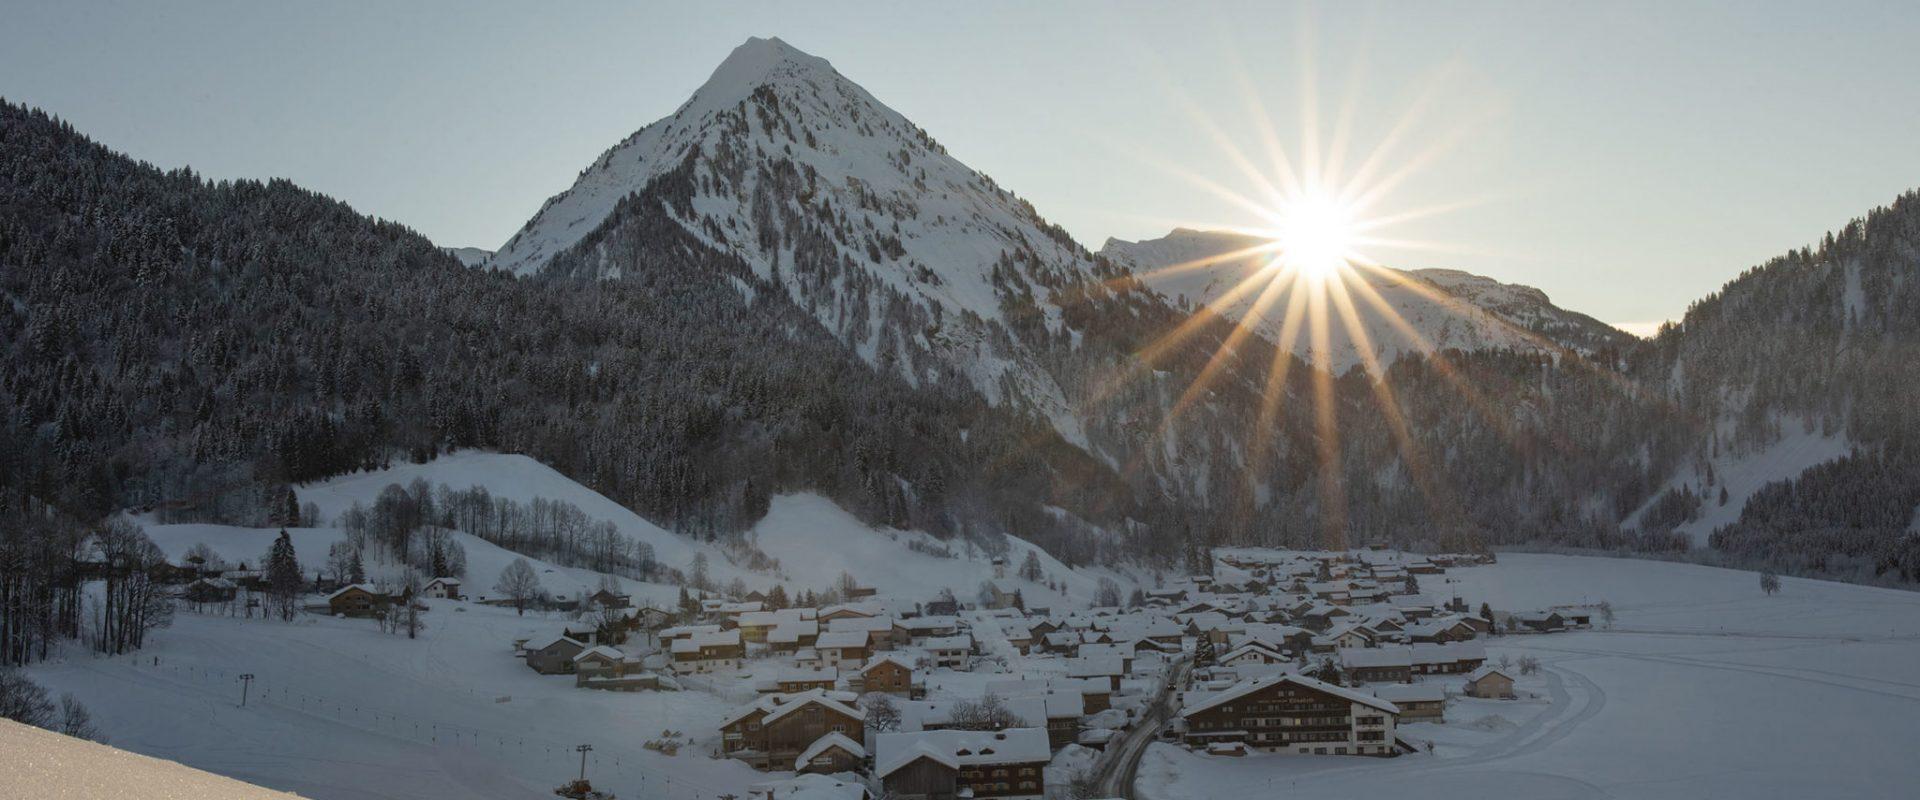 Schoppernau im Winter © Emanuel Sutterlüty - Au-Schoppernau Tourismus